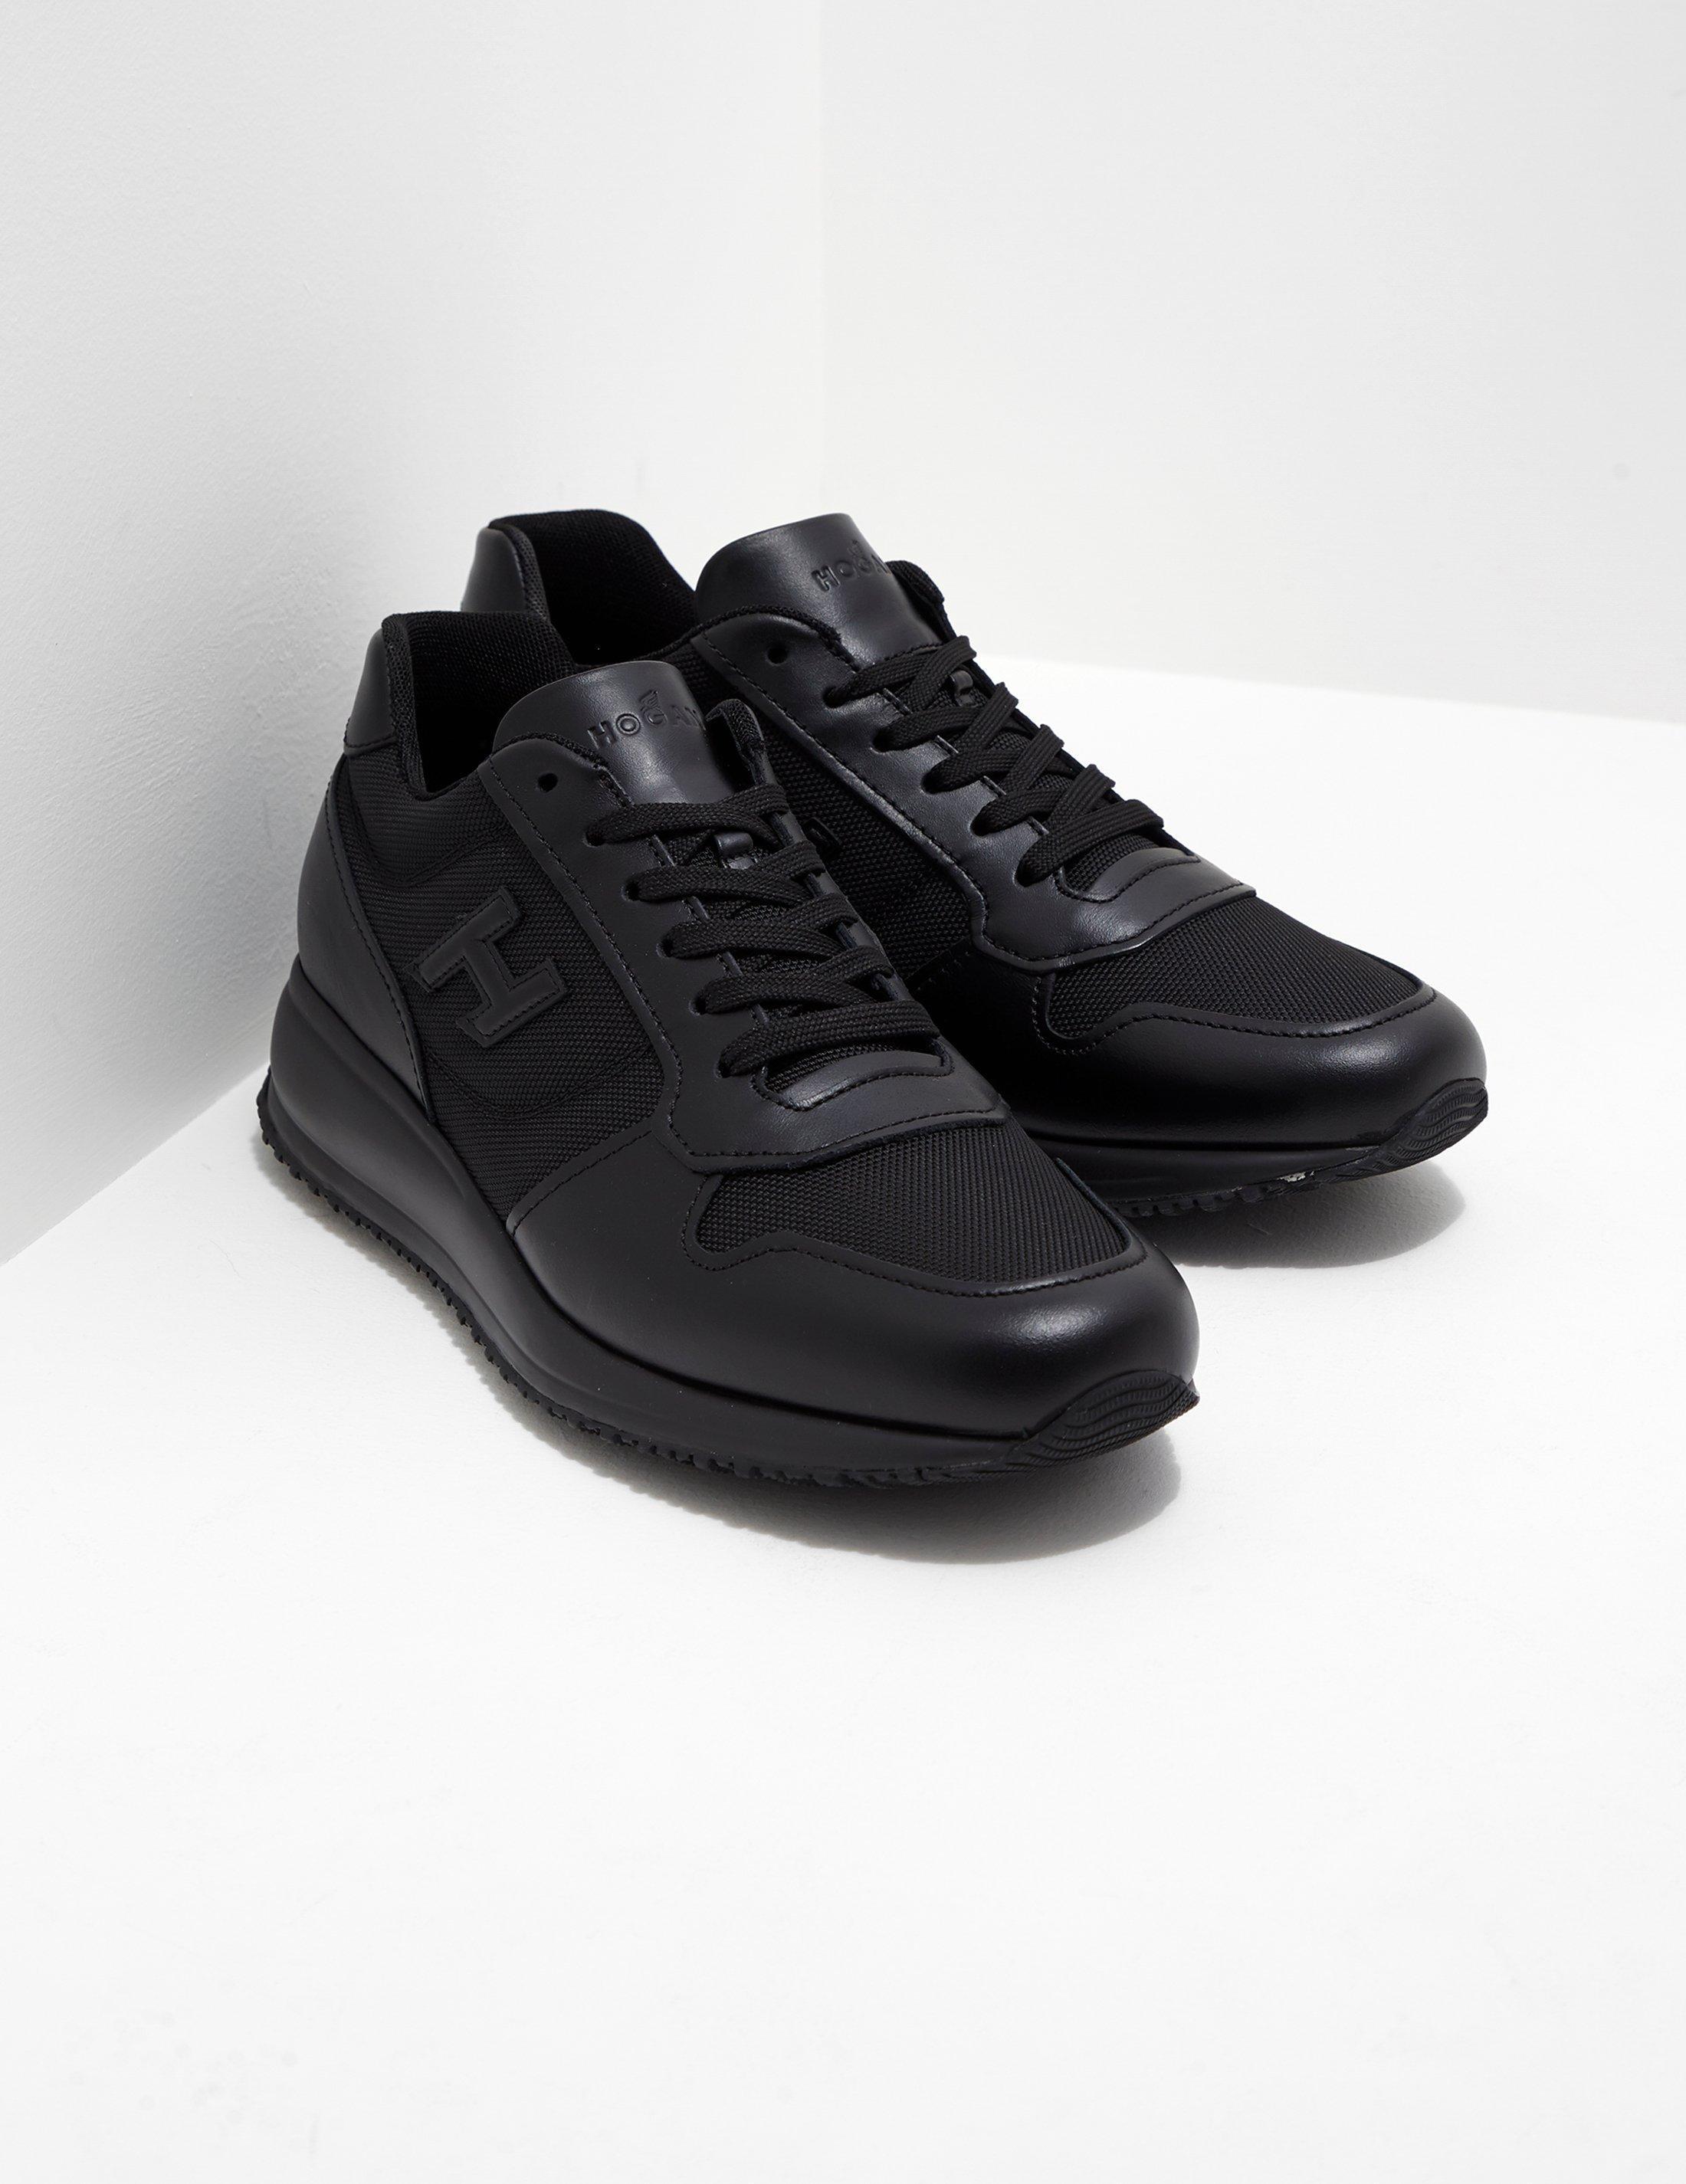 Hogan Leather Mens N20 Black for Men - Lyst